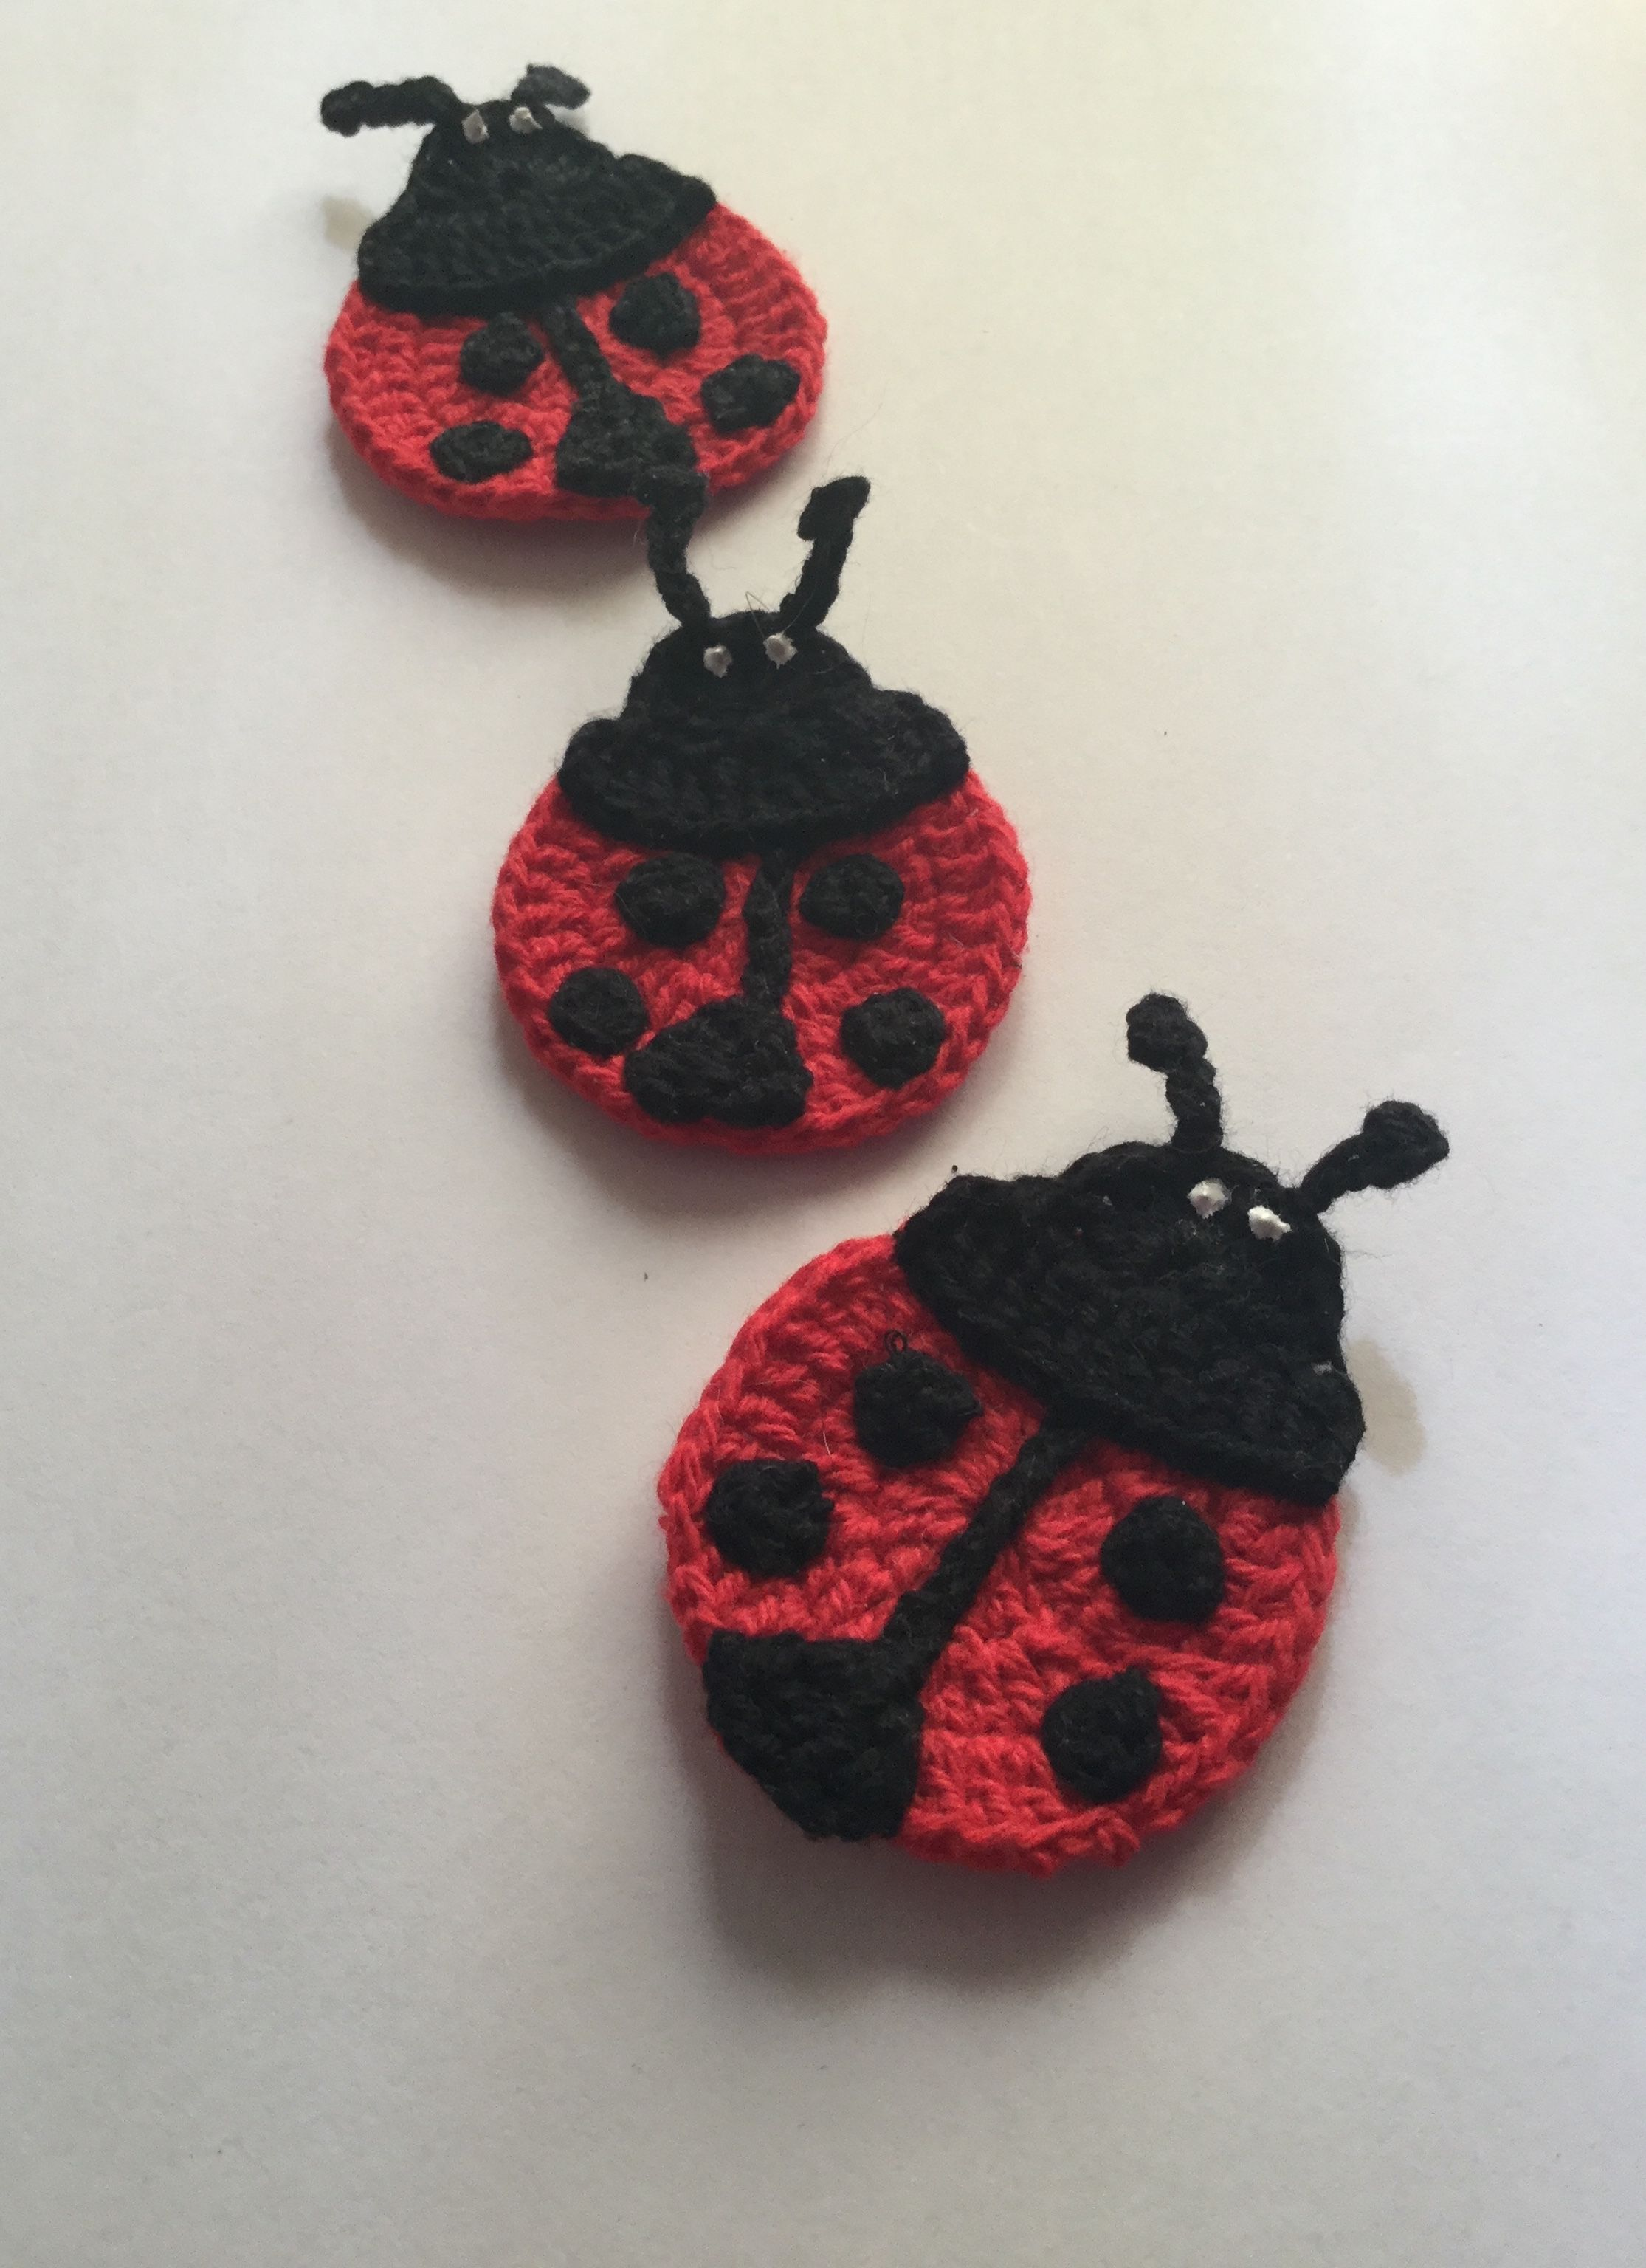 Crochet Ladybug Applique Pattern